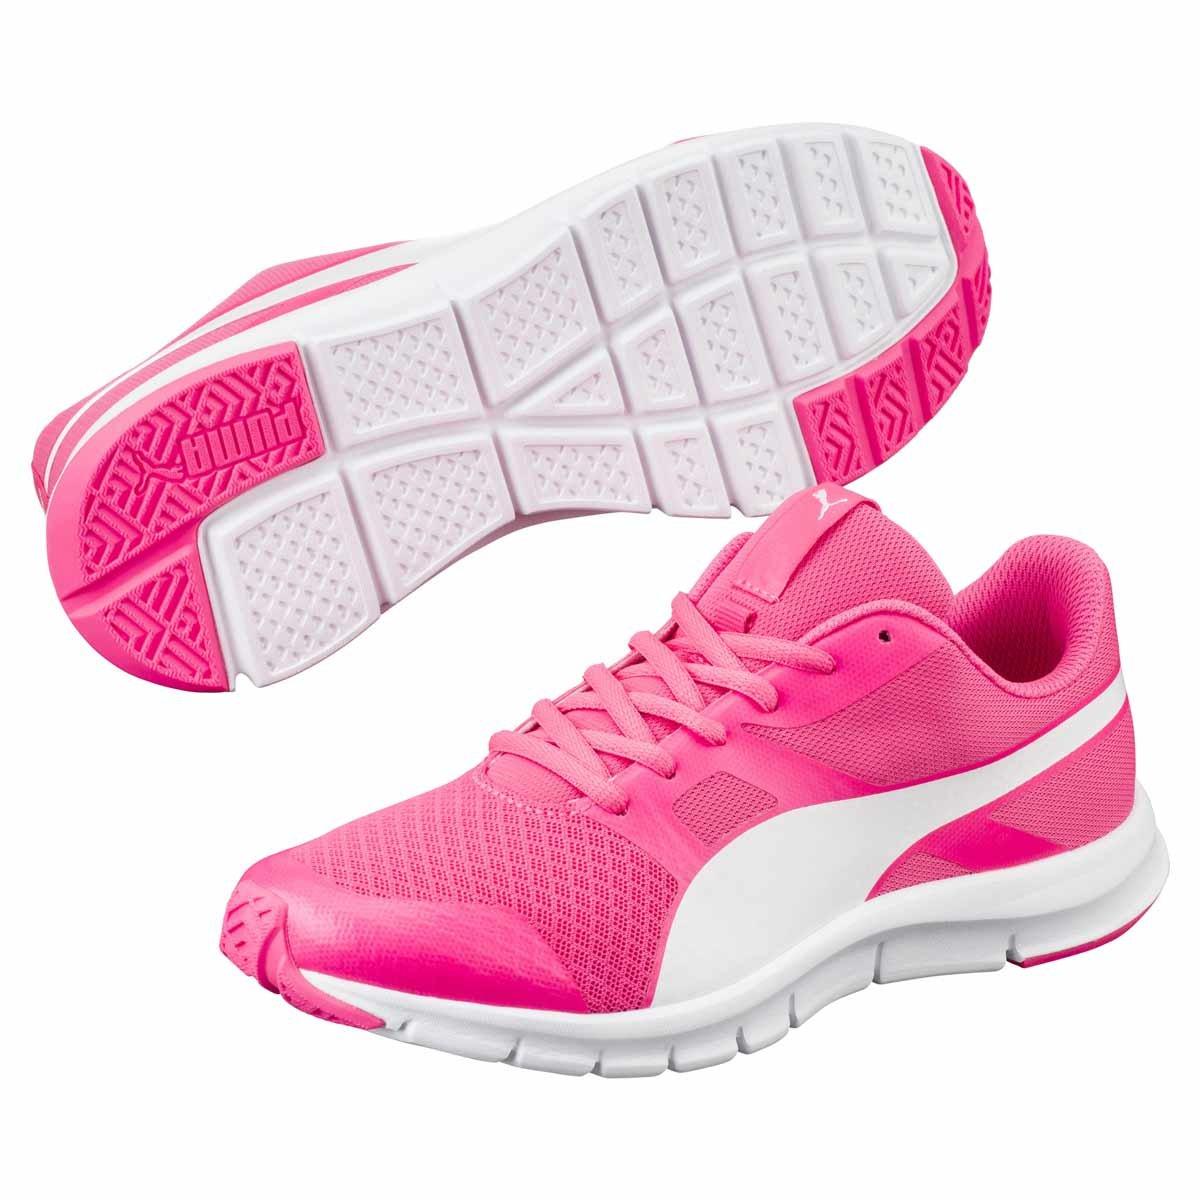 deportivas mujer running ofertas puma